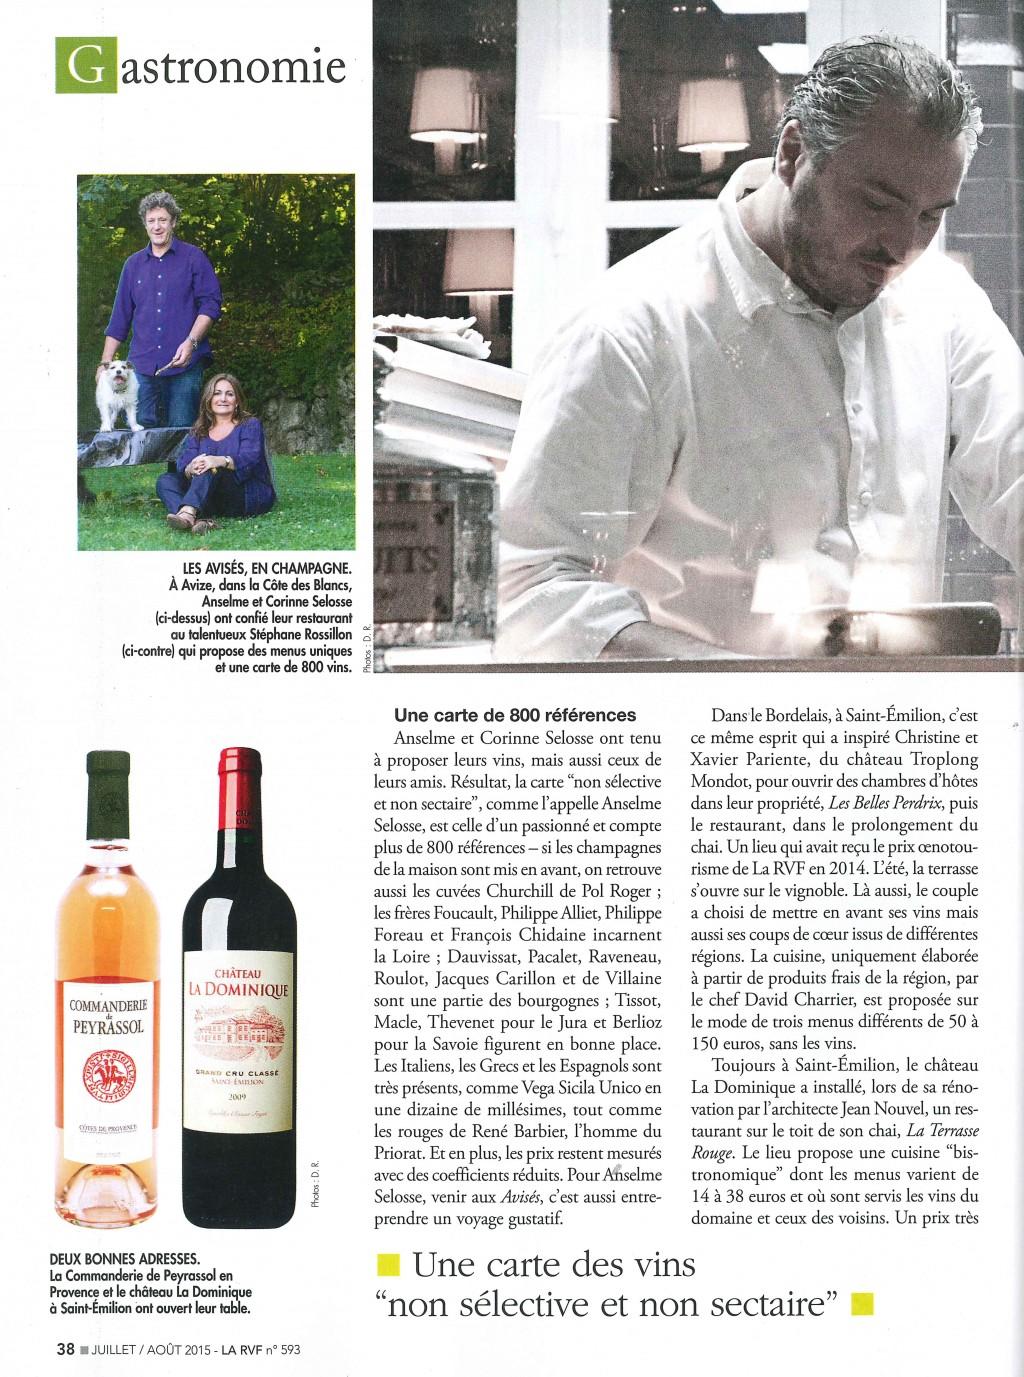 La revue des vins de france juillet 2015 olivier leflaive for Revue des vins de france